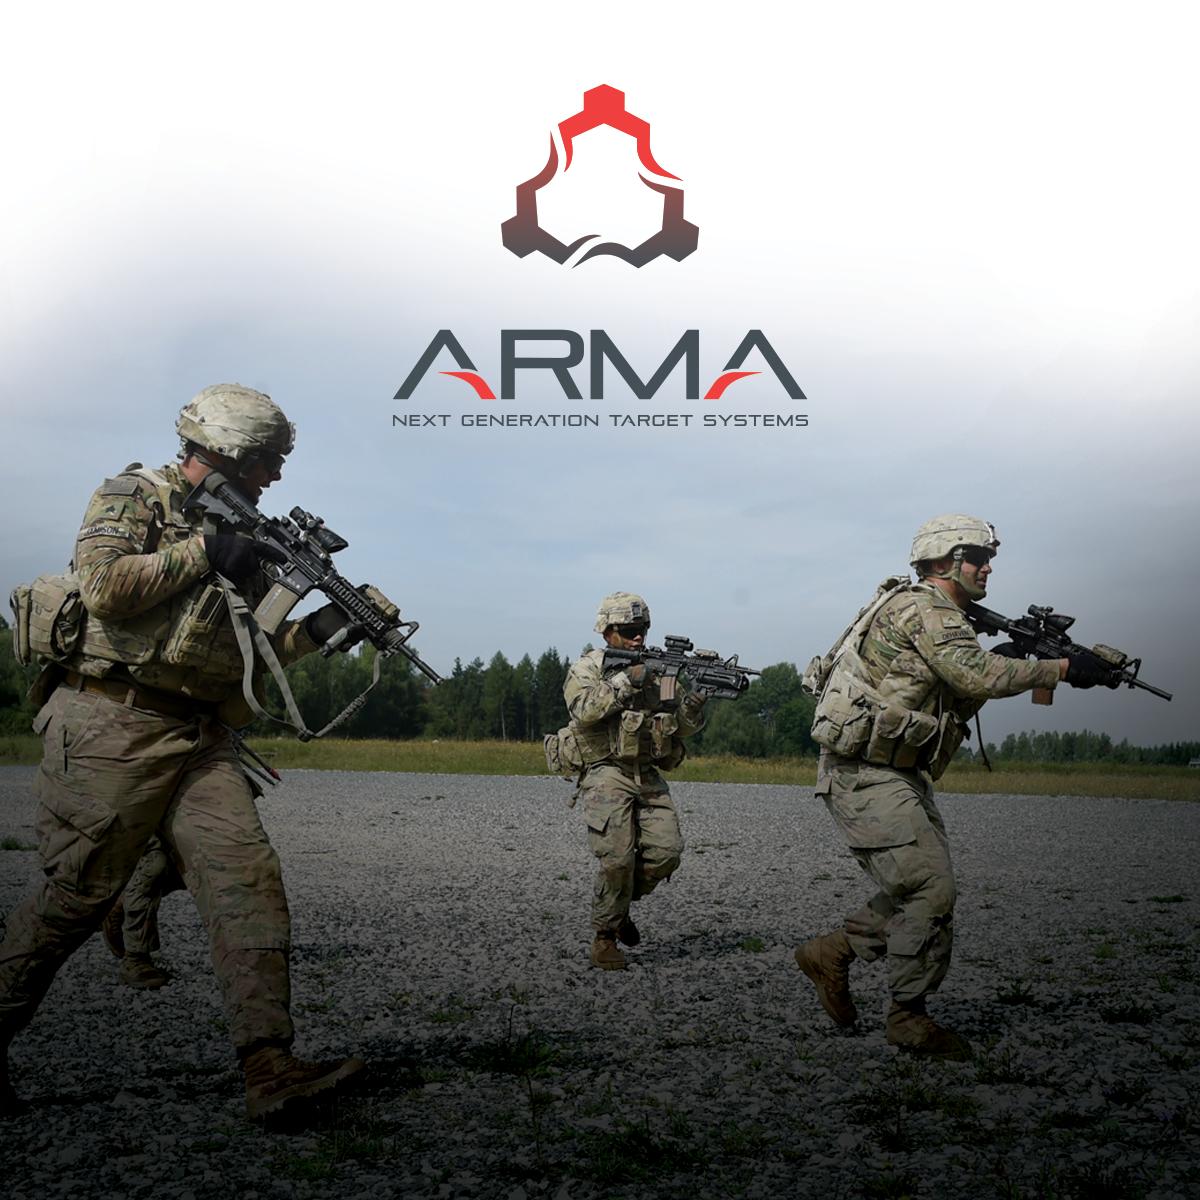 ARMA Next-Gen Target Systems logo design